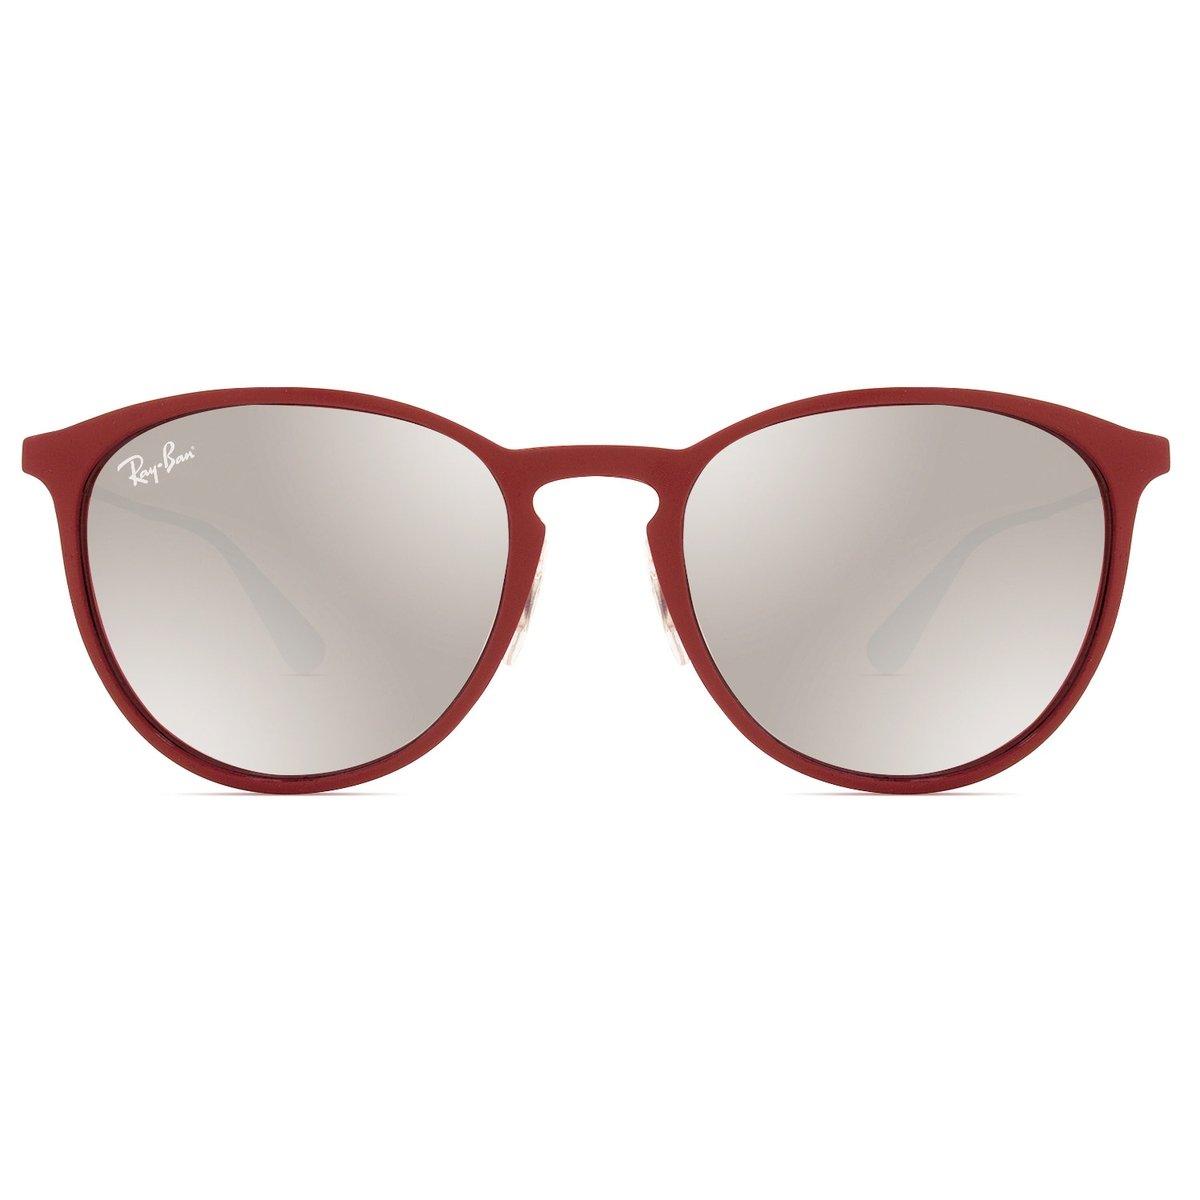 Preço Oculos Ray Ban Erika « One More Soul a93bf23ec2